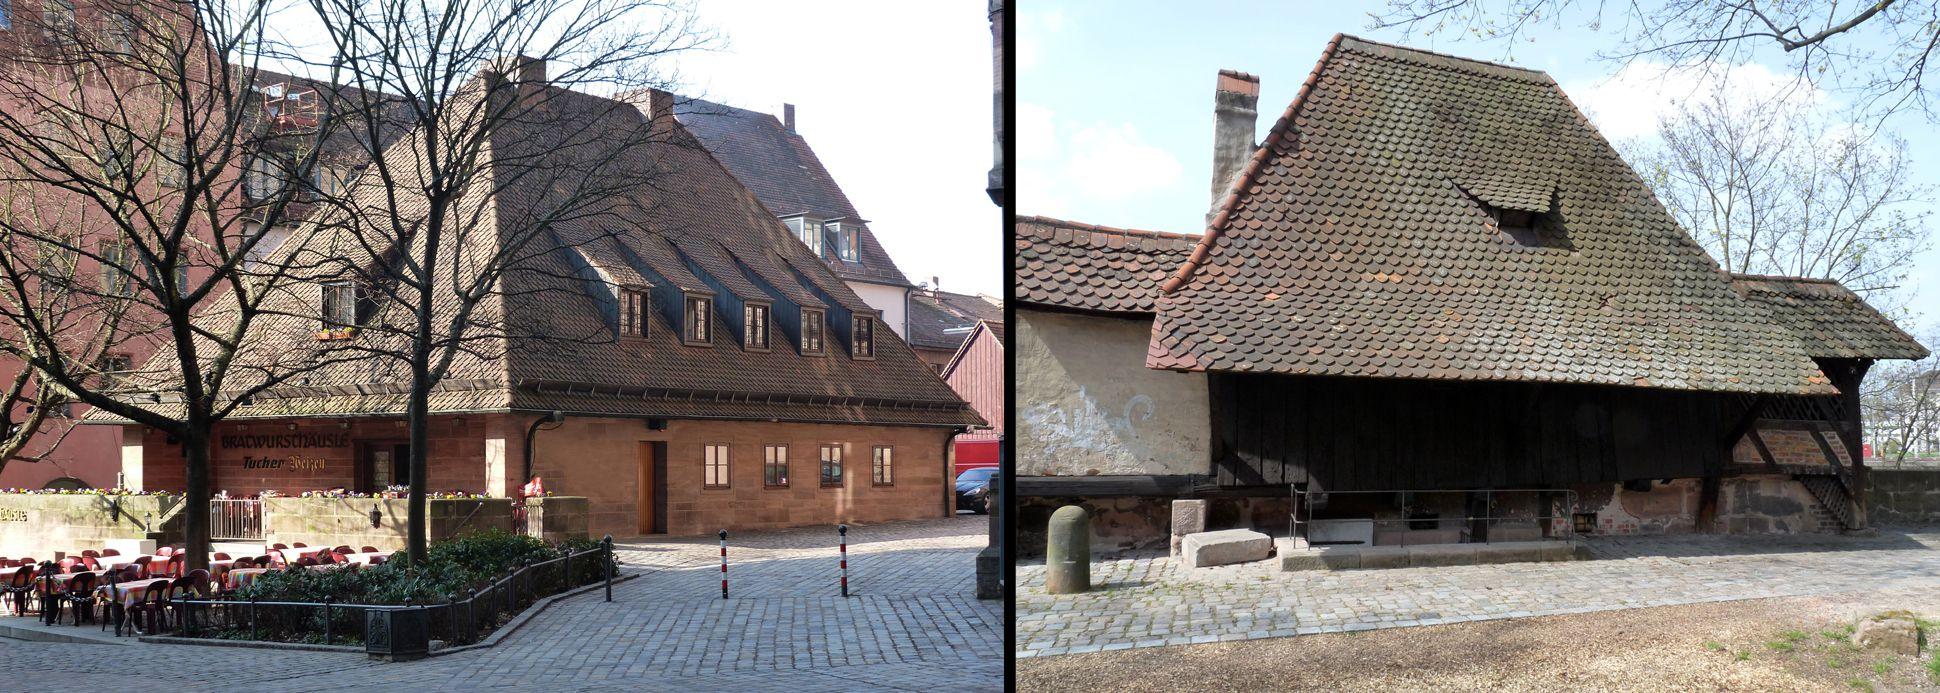 Bratwursthäusle Comparison of Bratwursthäusle and Grabenturm tower of the15./16.th c.